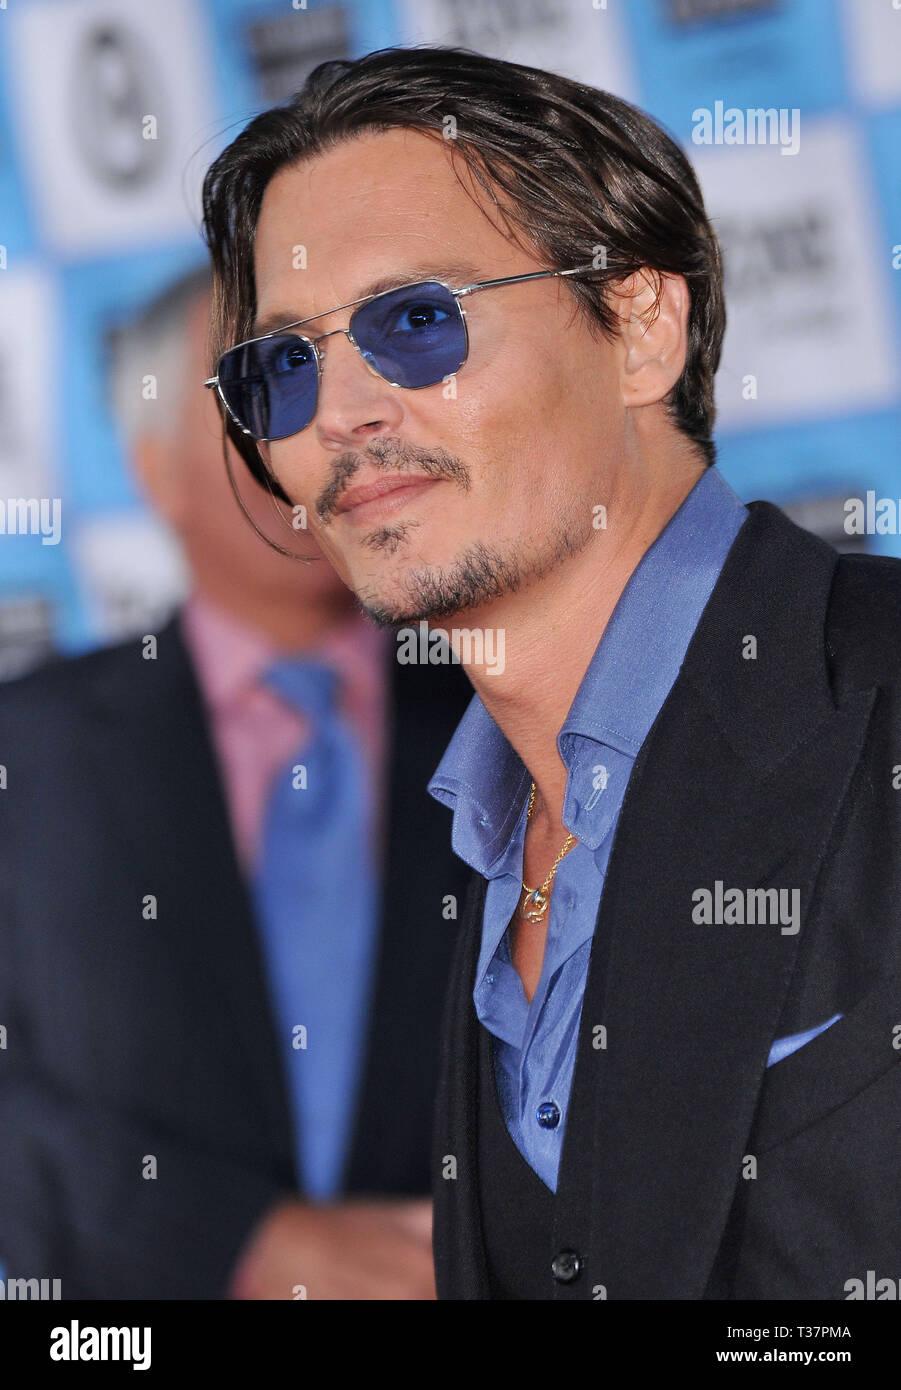 f0daf732358 Johnny Depp - Los Angeles Film Festival Public Enemies Premiere at the  Westwood Village Theatre In